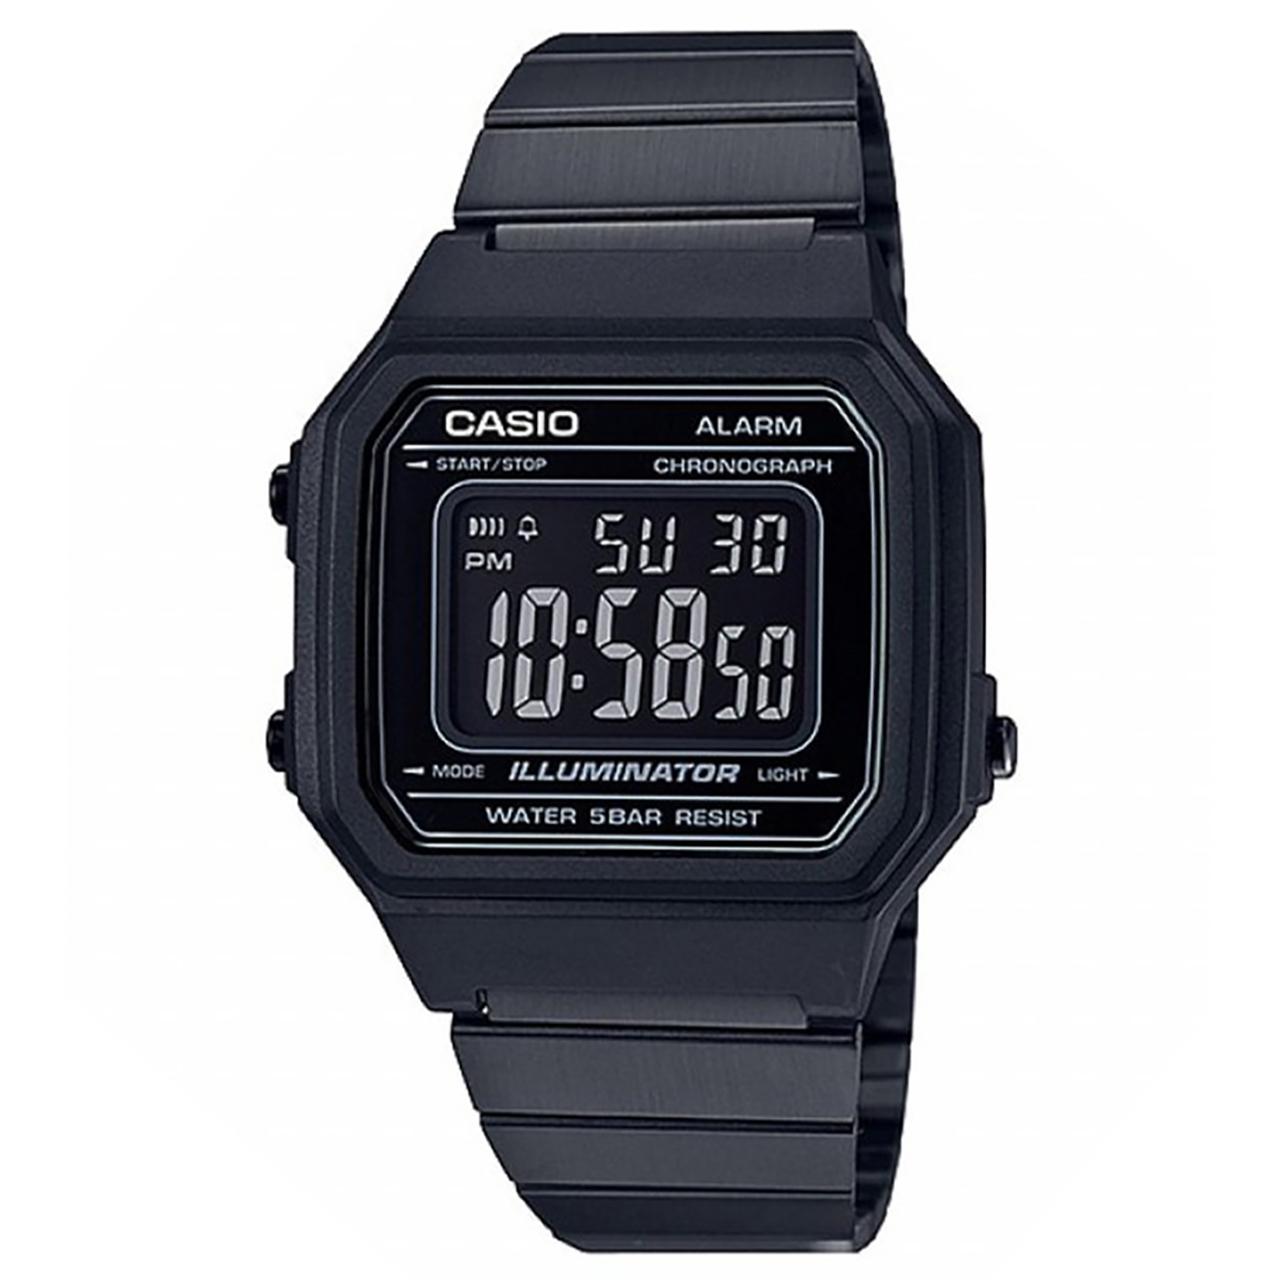 ساعت مچی دیجیتالی کاسیو مدل B650WB-1BDF 4